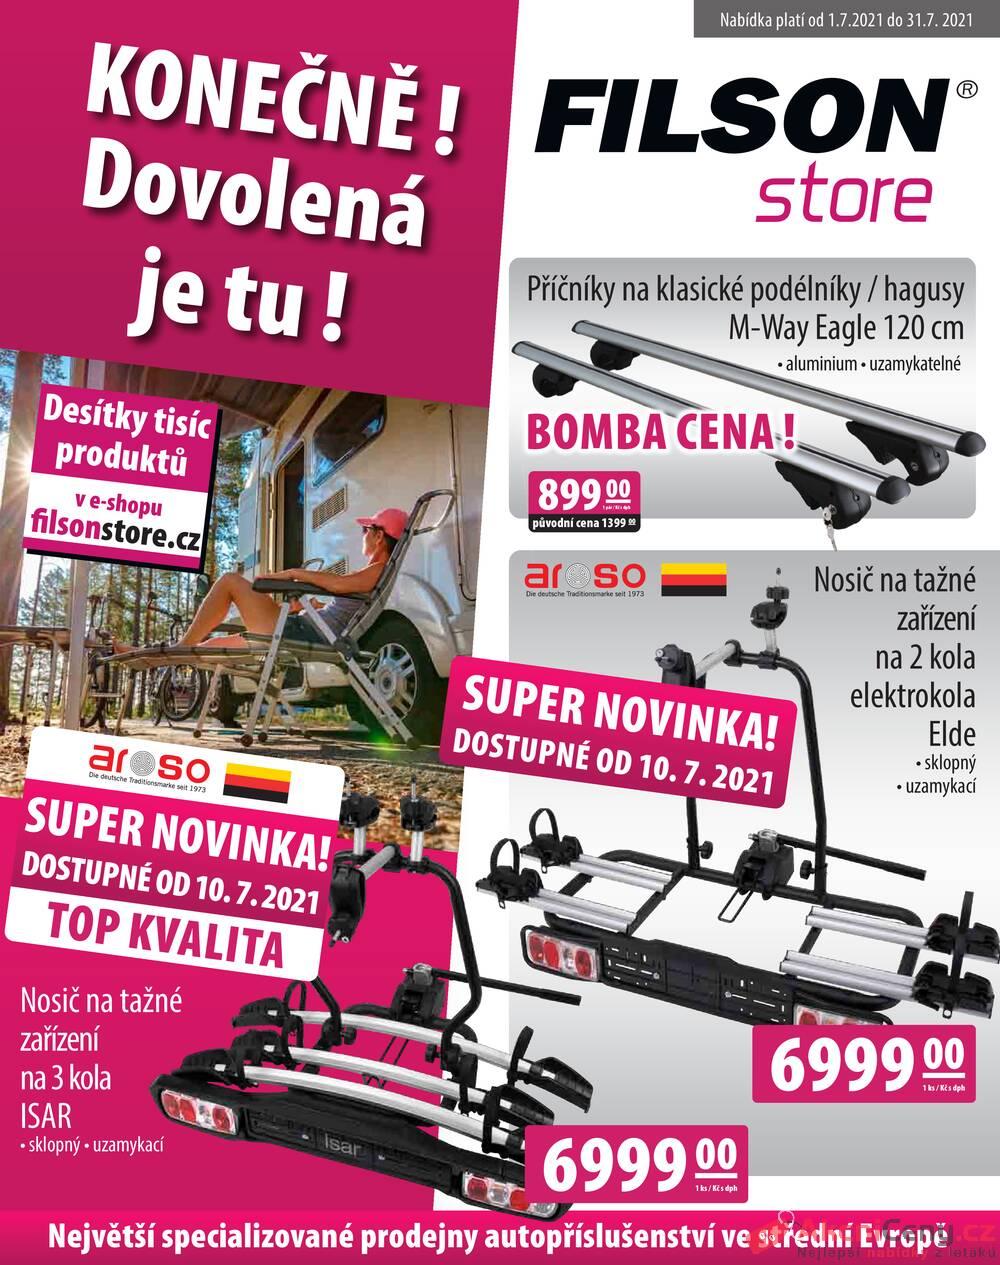 Leták Filson Store - Filson Store od 1.7. do 31.7.2021 - strana 1